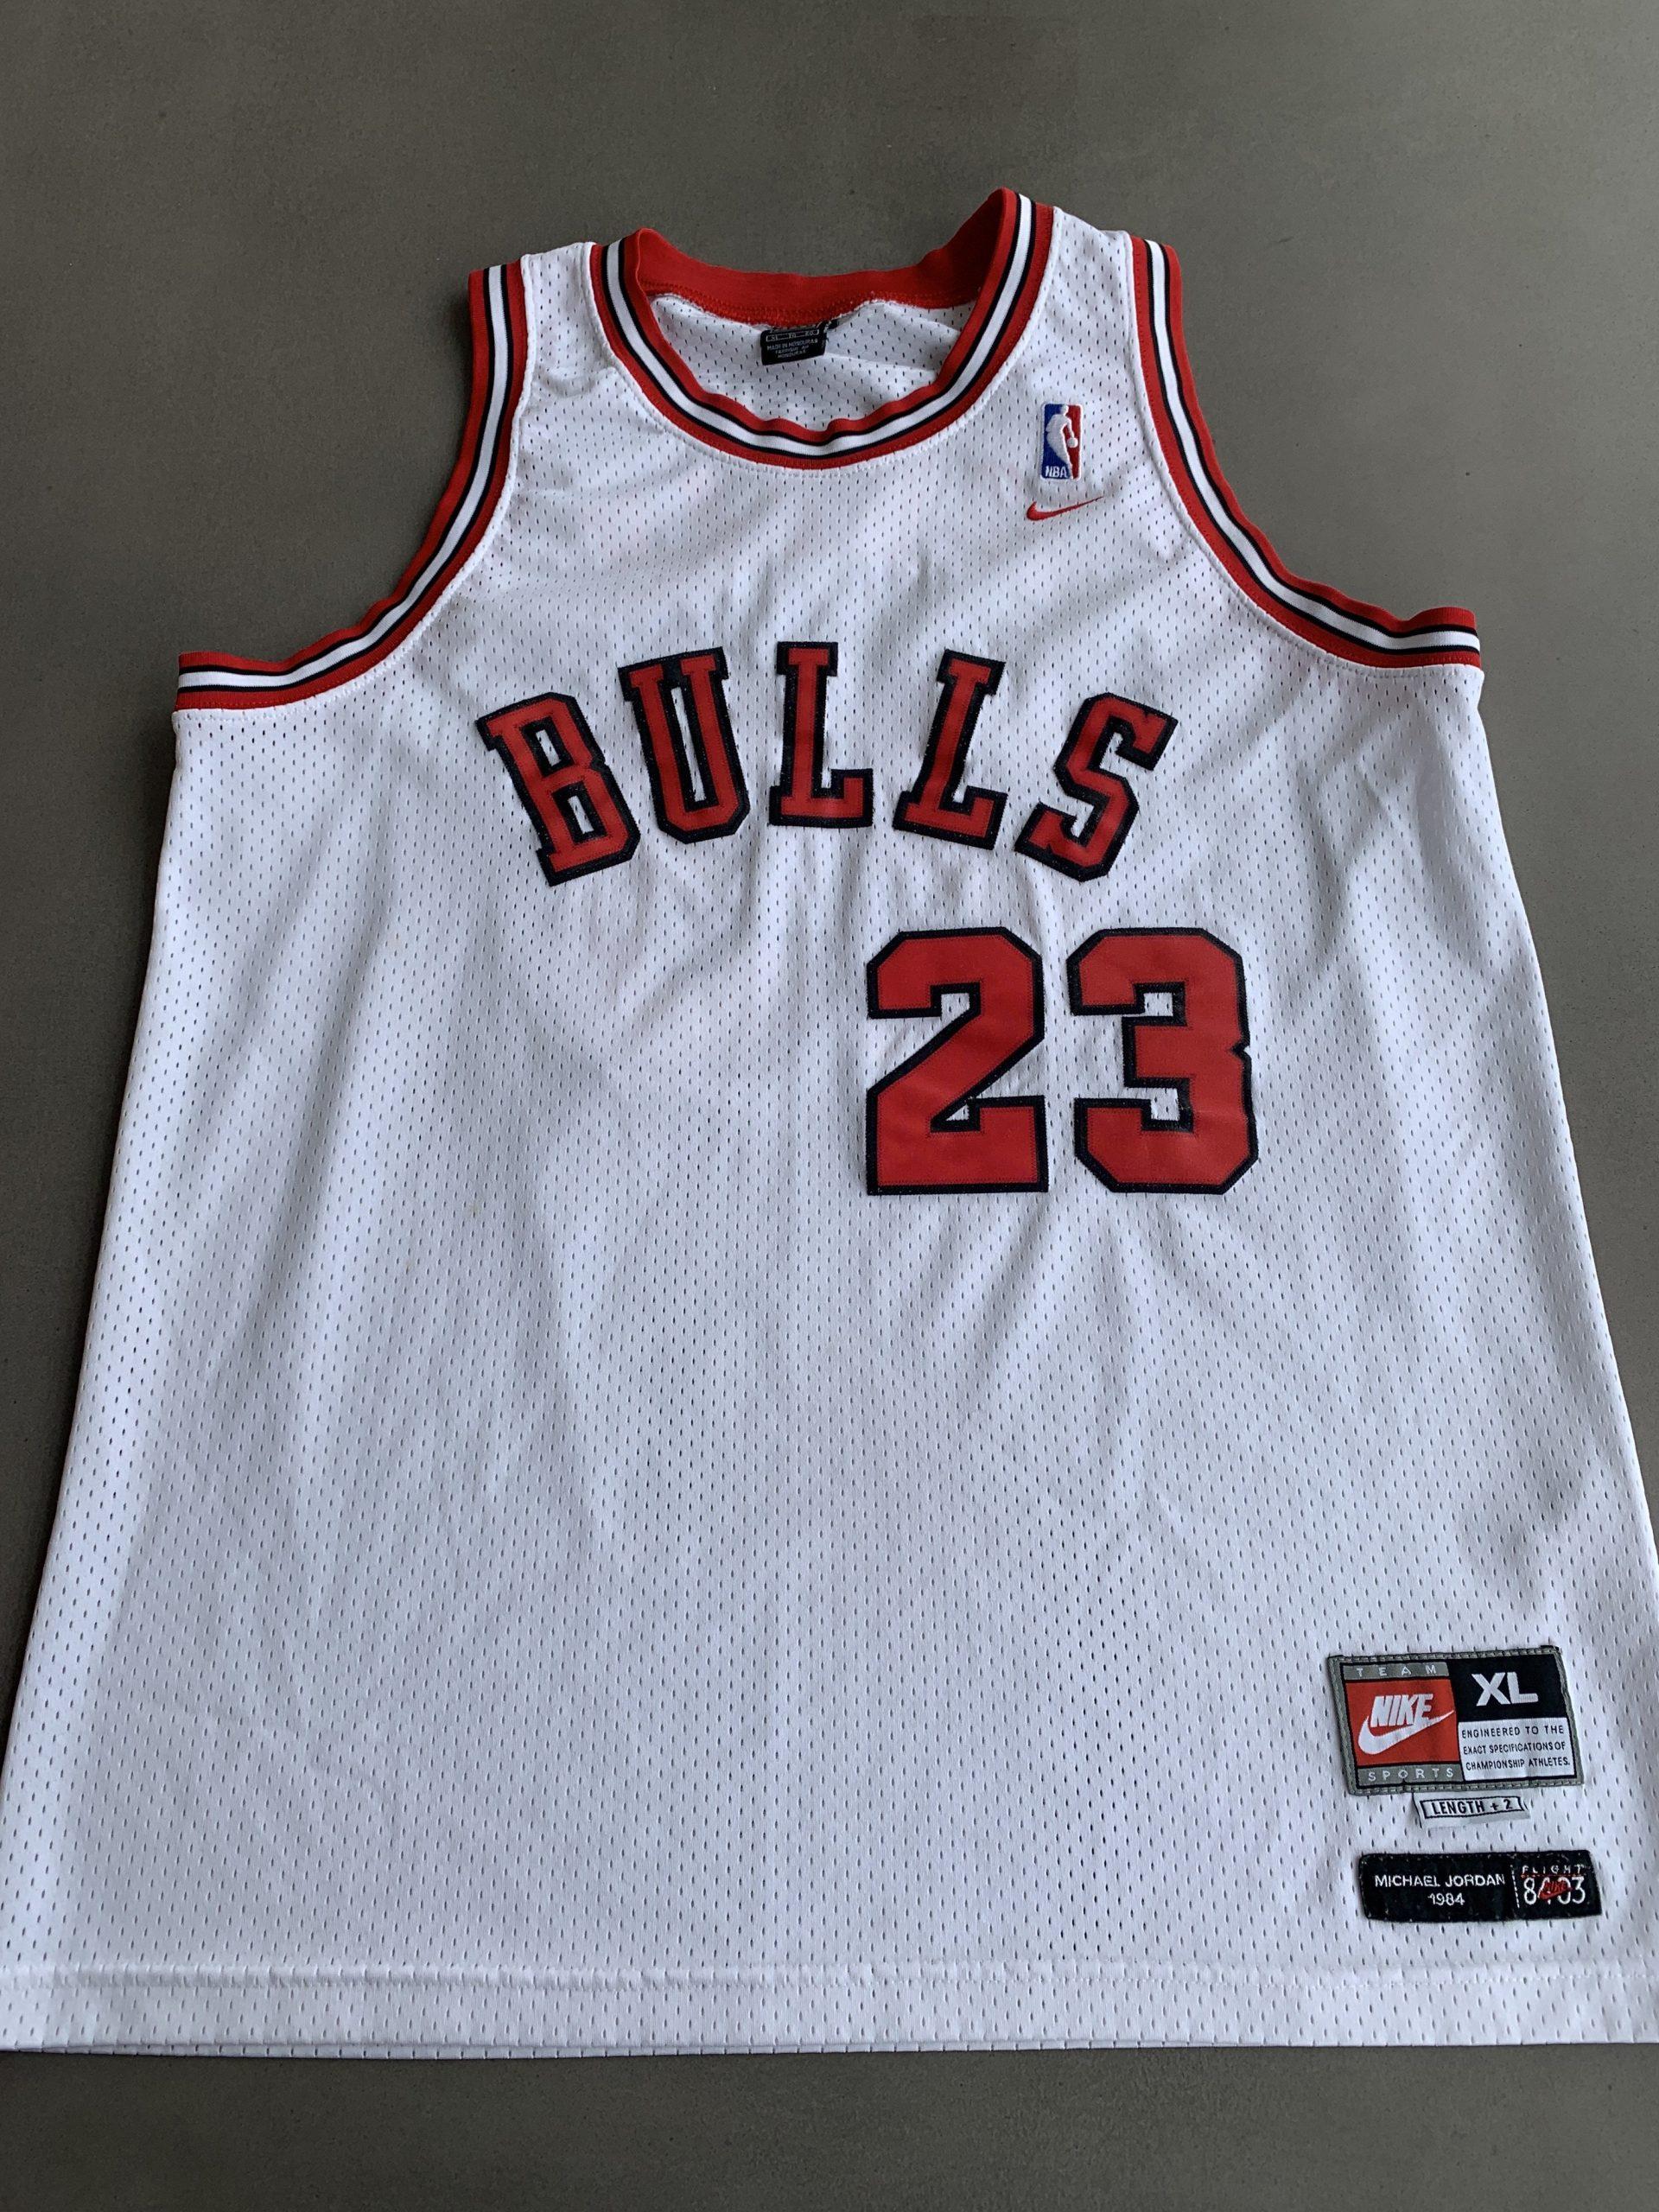 wholesale jerseys online, OFF 77%,Buy!